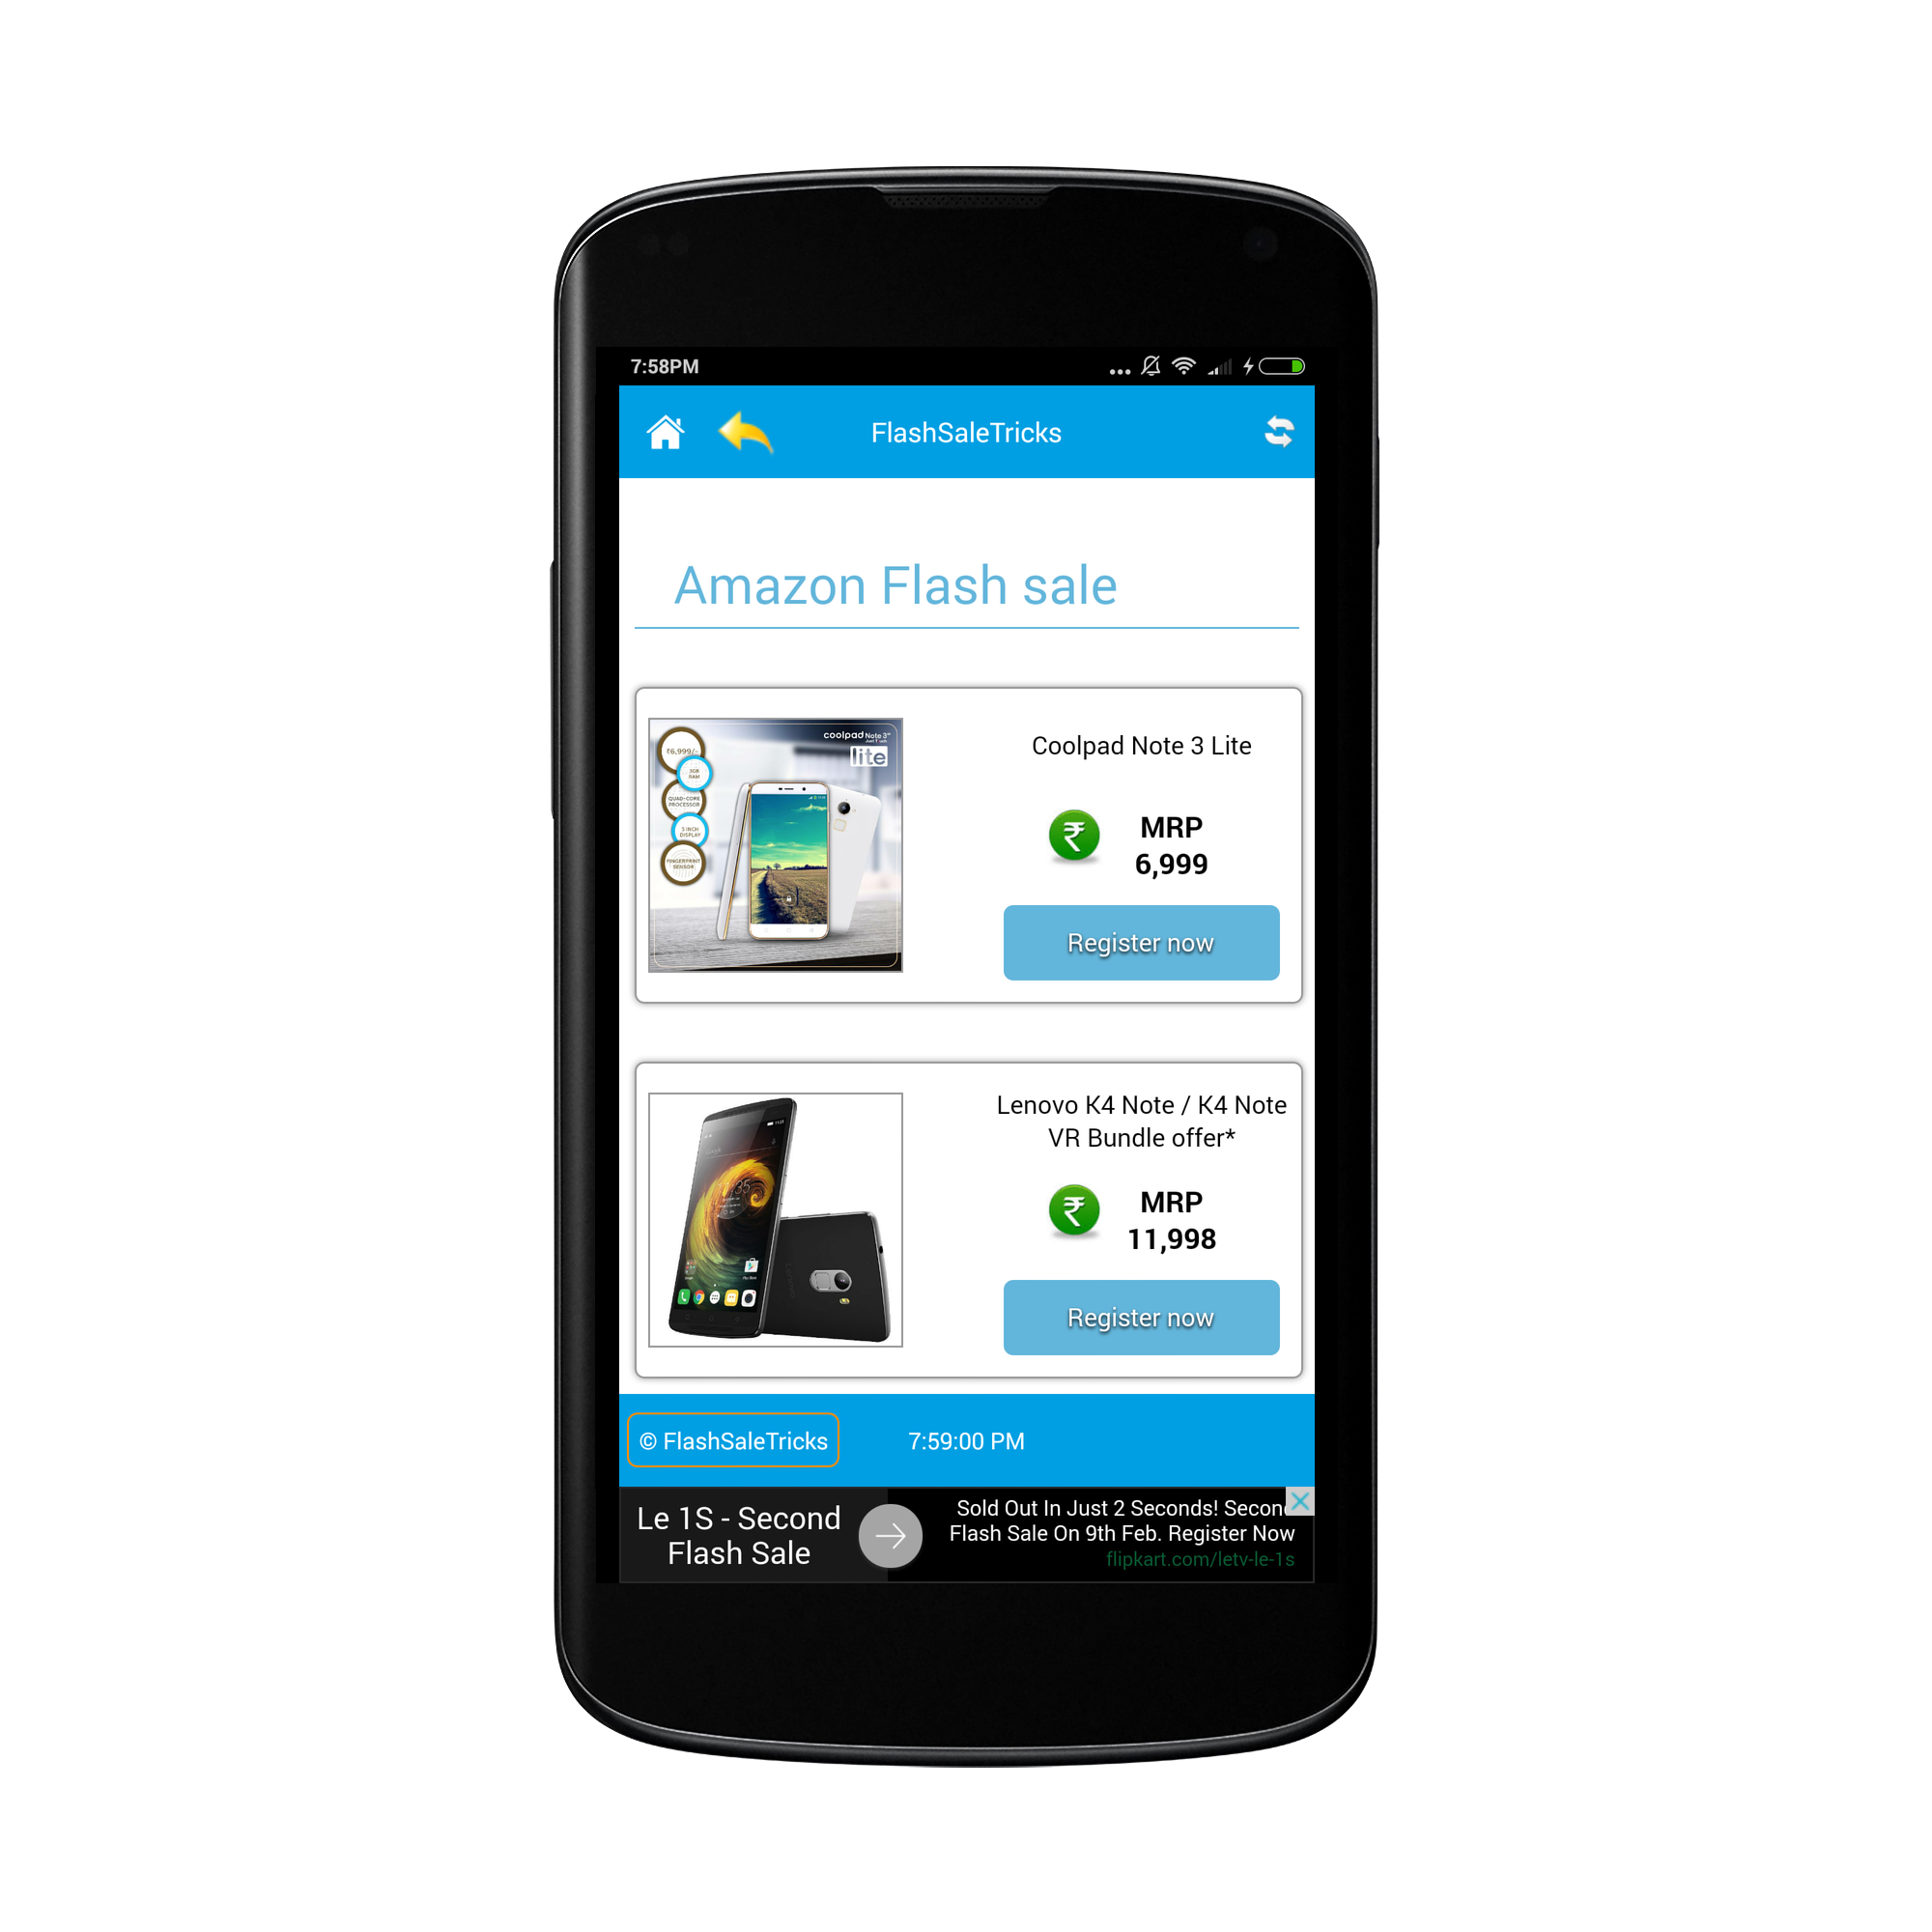 FlashSaleTricks Autobuy Android App for flash sale - FlashSaleTricks